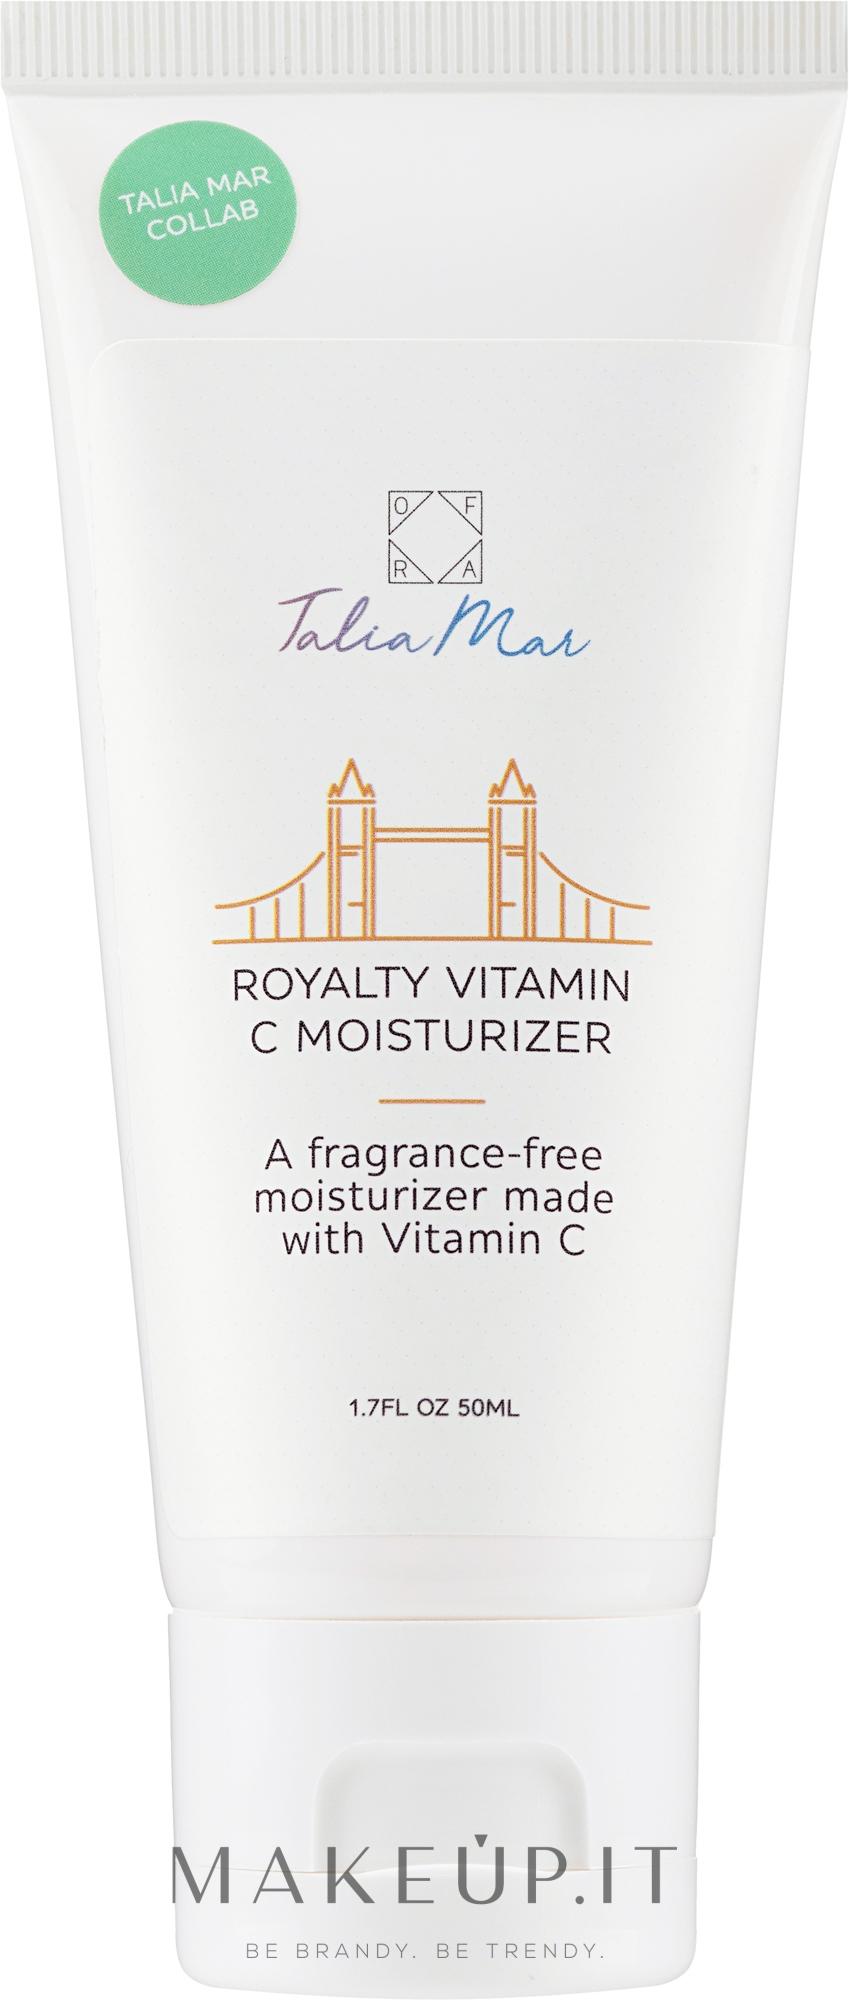 Crema viso idratante alla vitamina C - Ofra Talia Mar Royalty Vitamin C Moisturizer — foto 50 ml